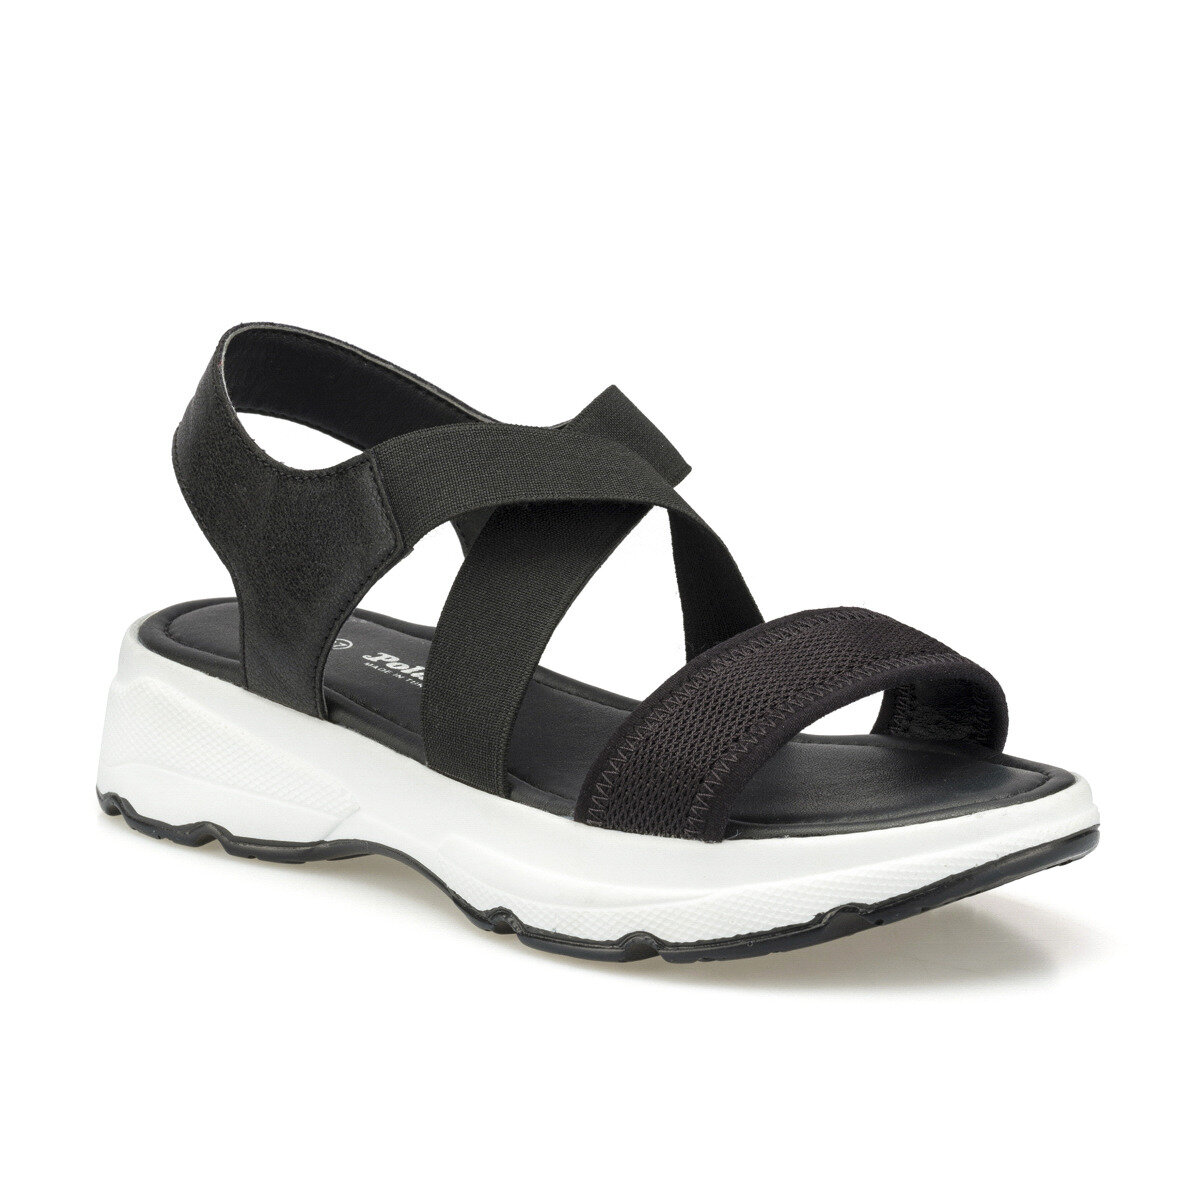 FLO 315500.Z Black Women Sandals Polaris